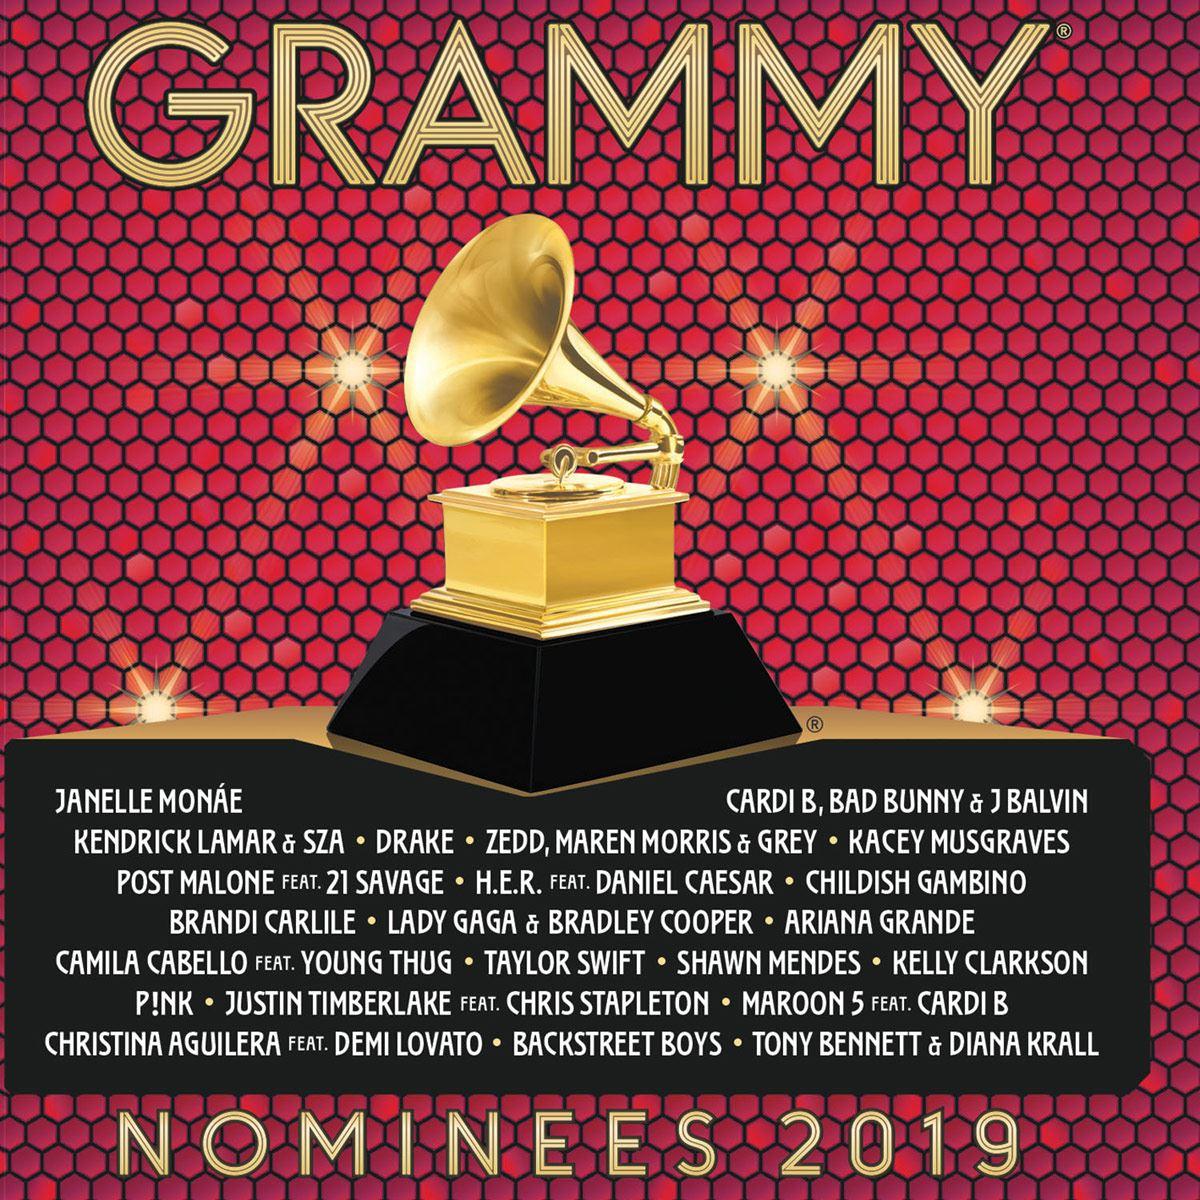 CD Varios Nominees Grammy 2019